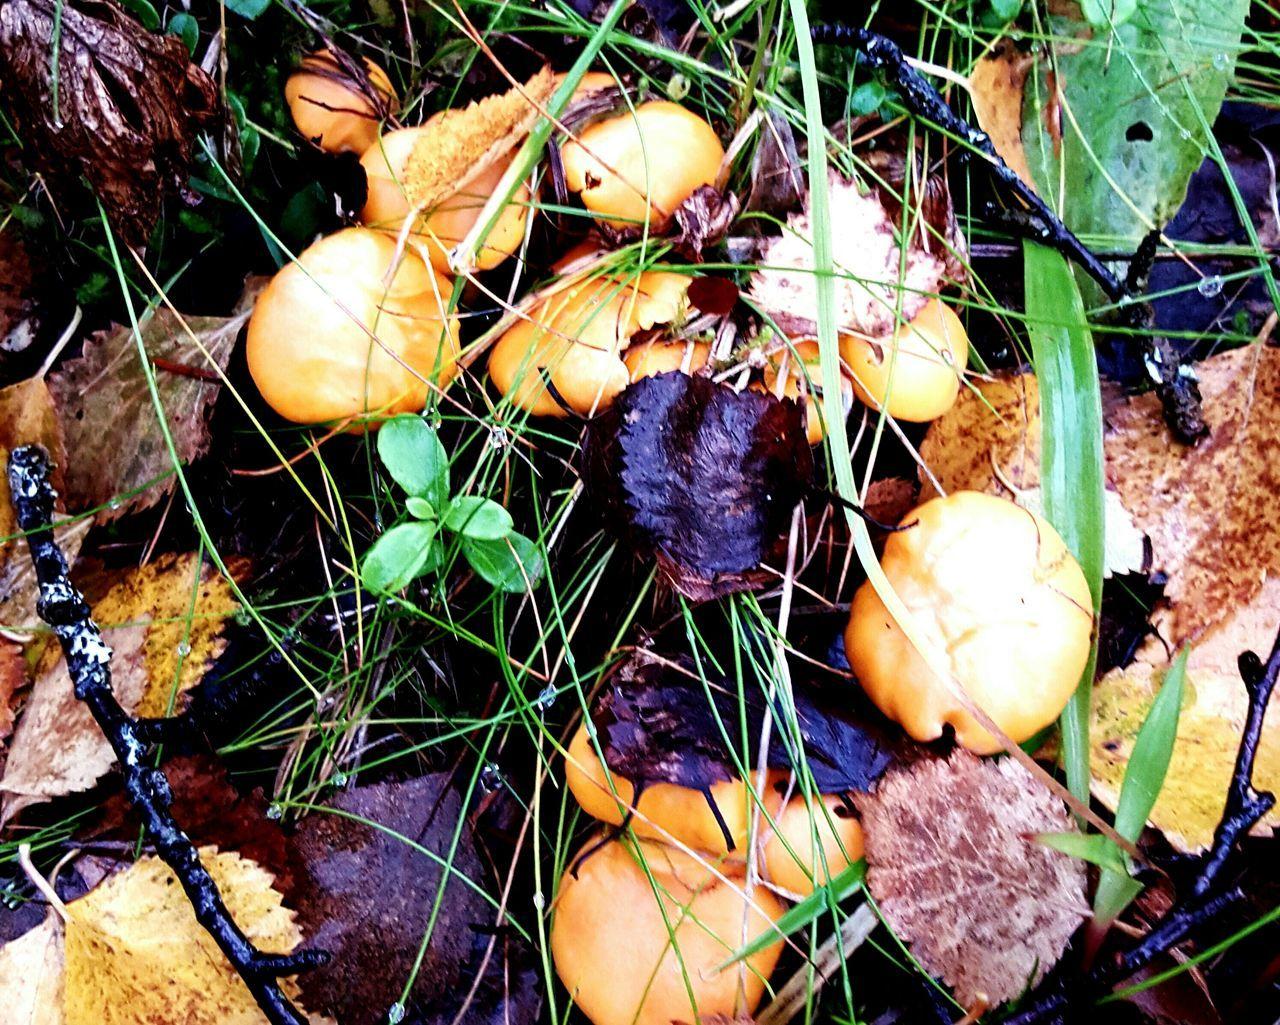 Picking chantarelles today Chantarelles Yellow Chantarelles In The Mountains October Sweet October!